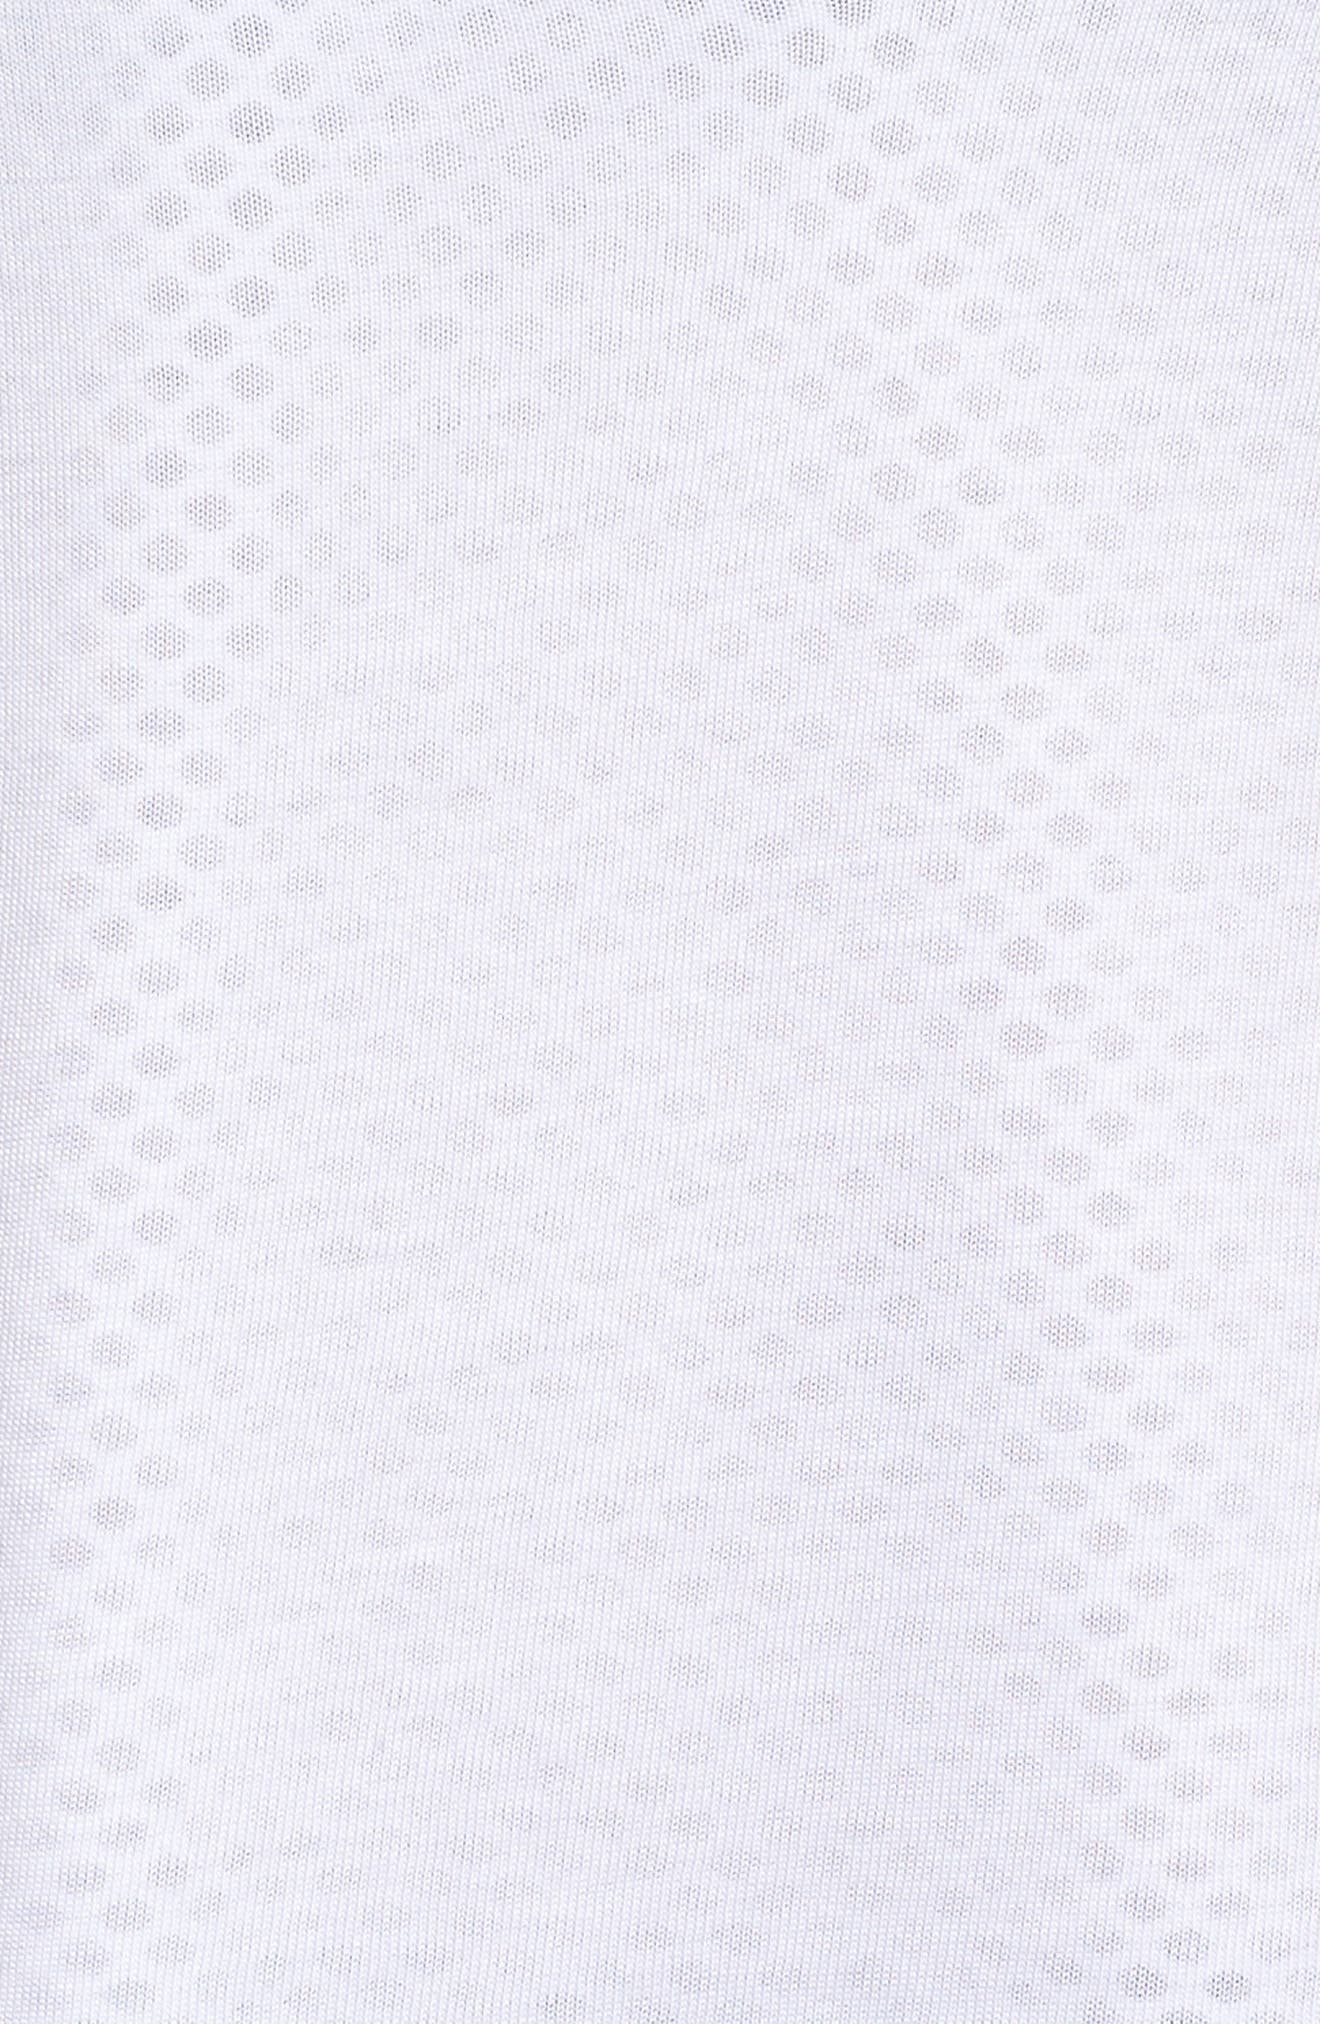 Banele Mesh Top,                             Alternate thumbnail 6, color,                             White